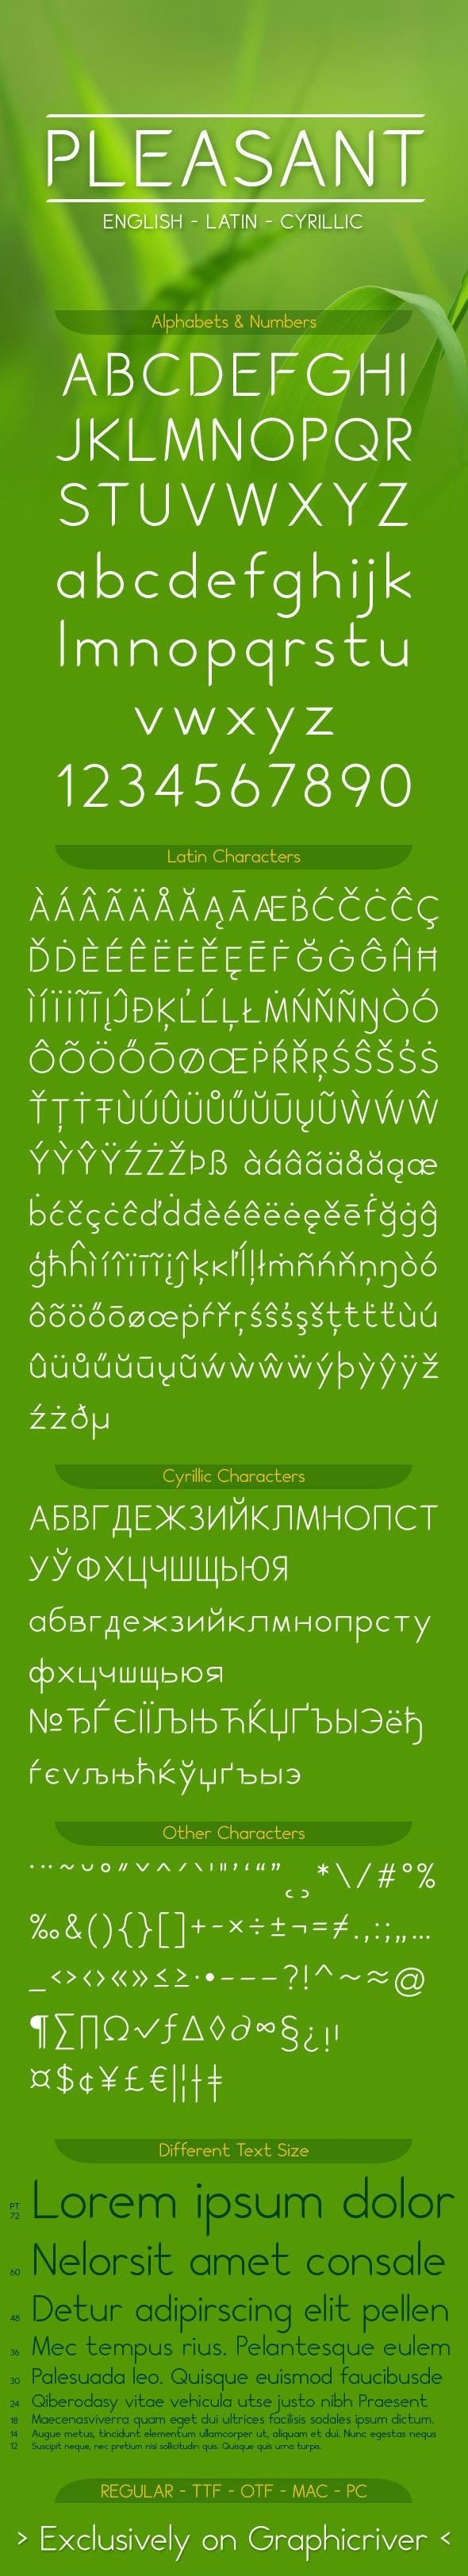 PLEASANT font - Sans-Serif Fonts